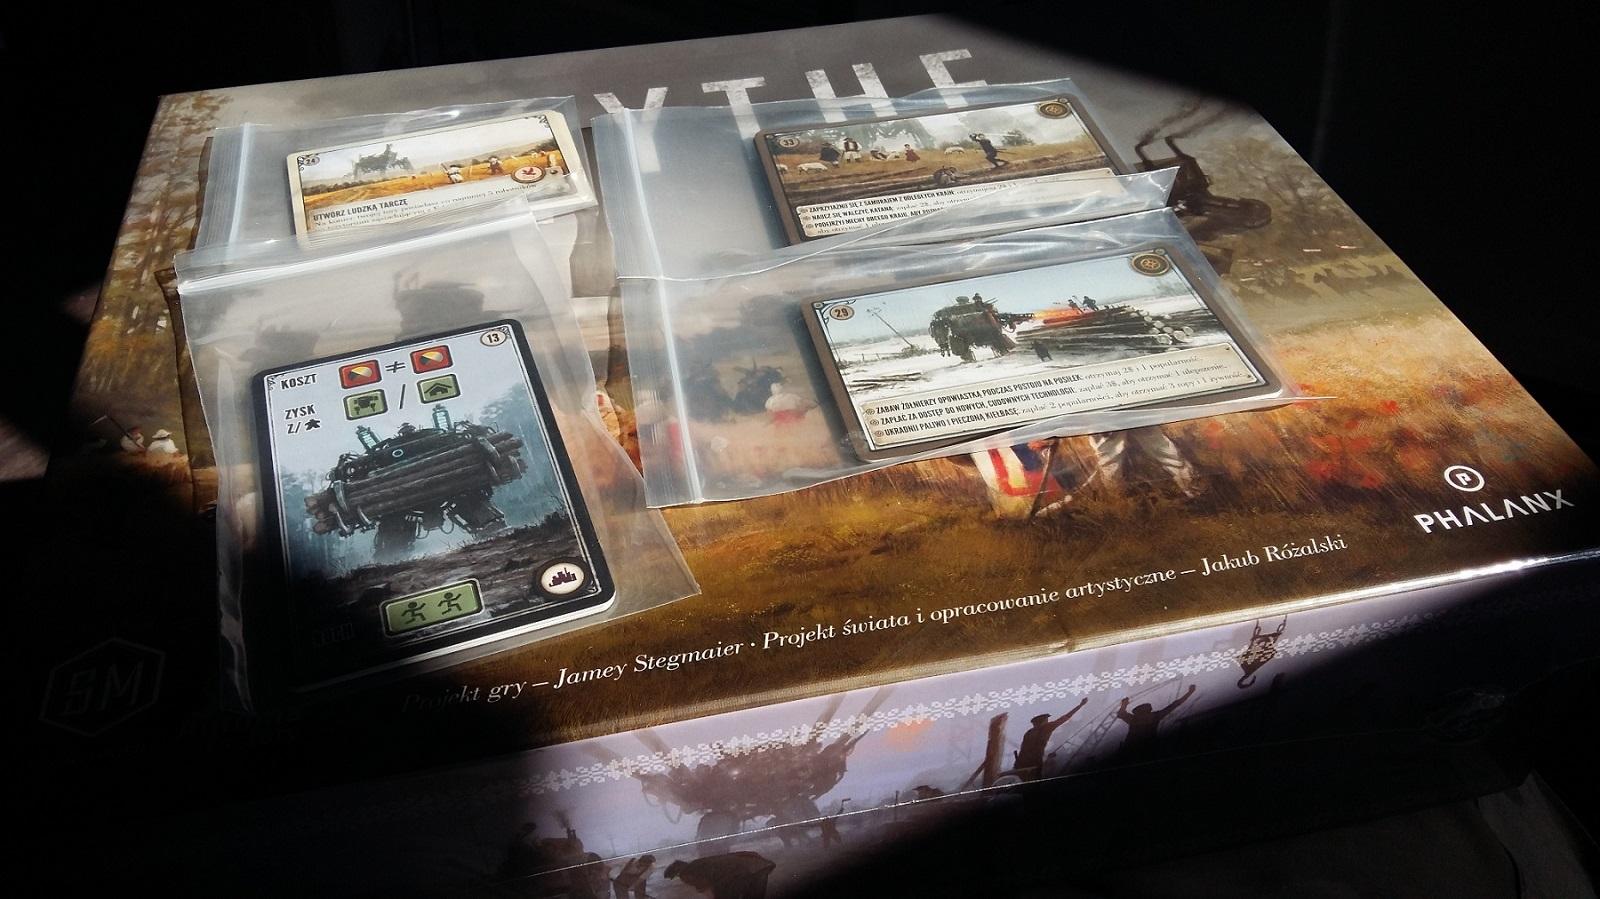 Scythe: karty promocyjne Kickstarter (wersja polska)